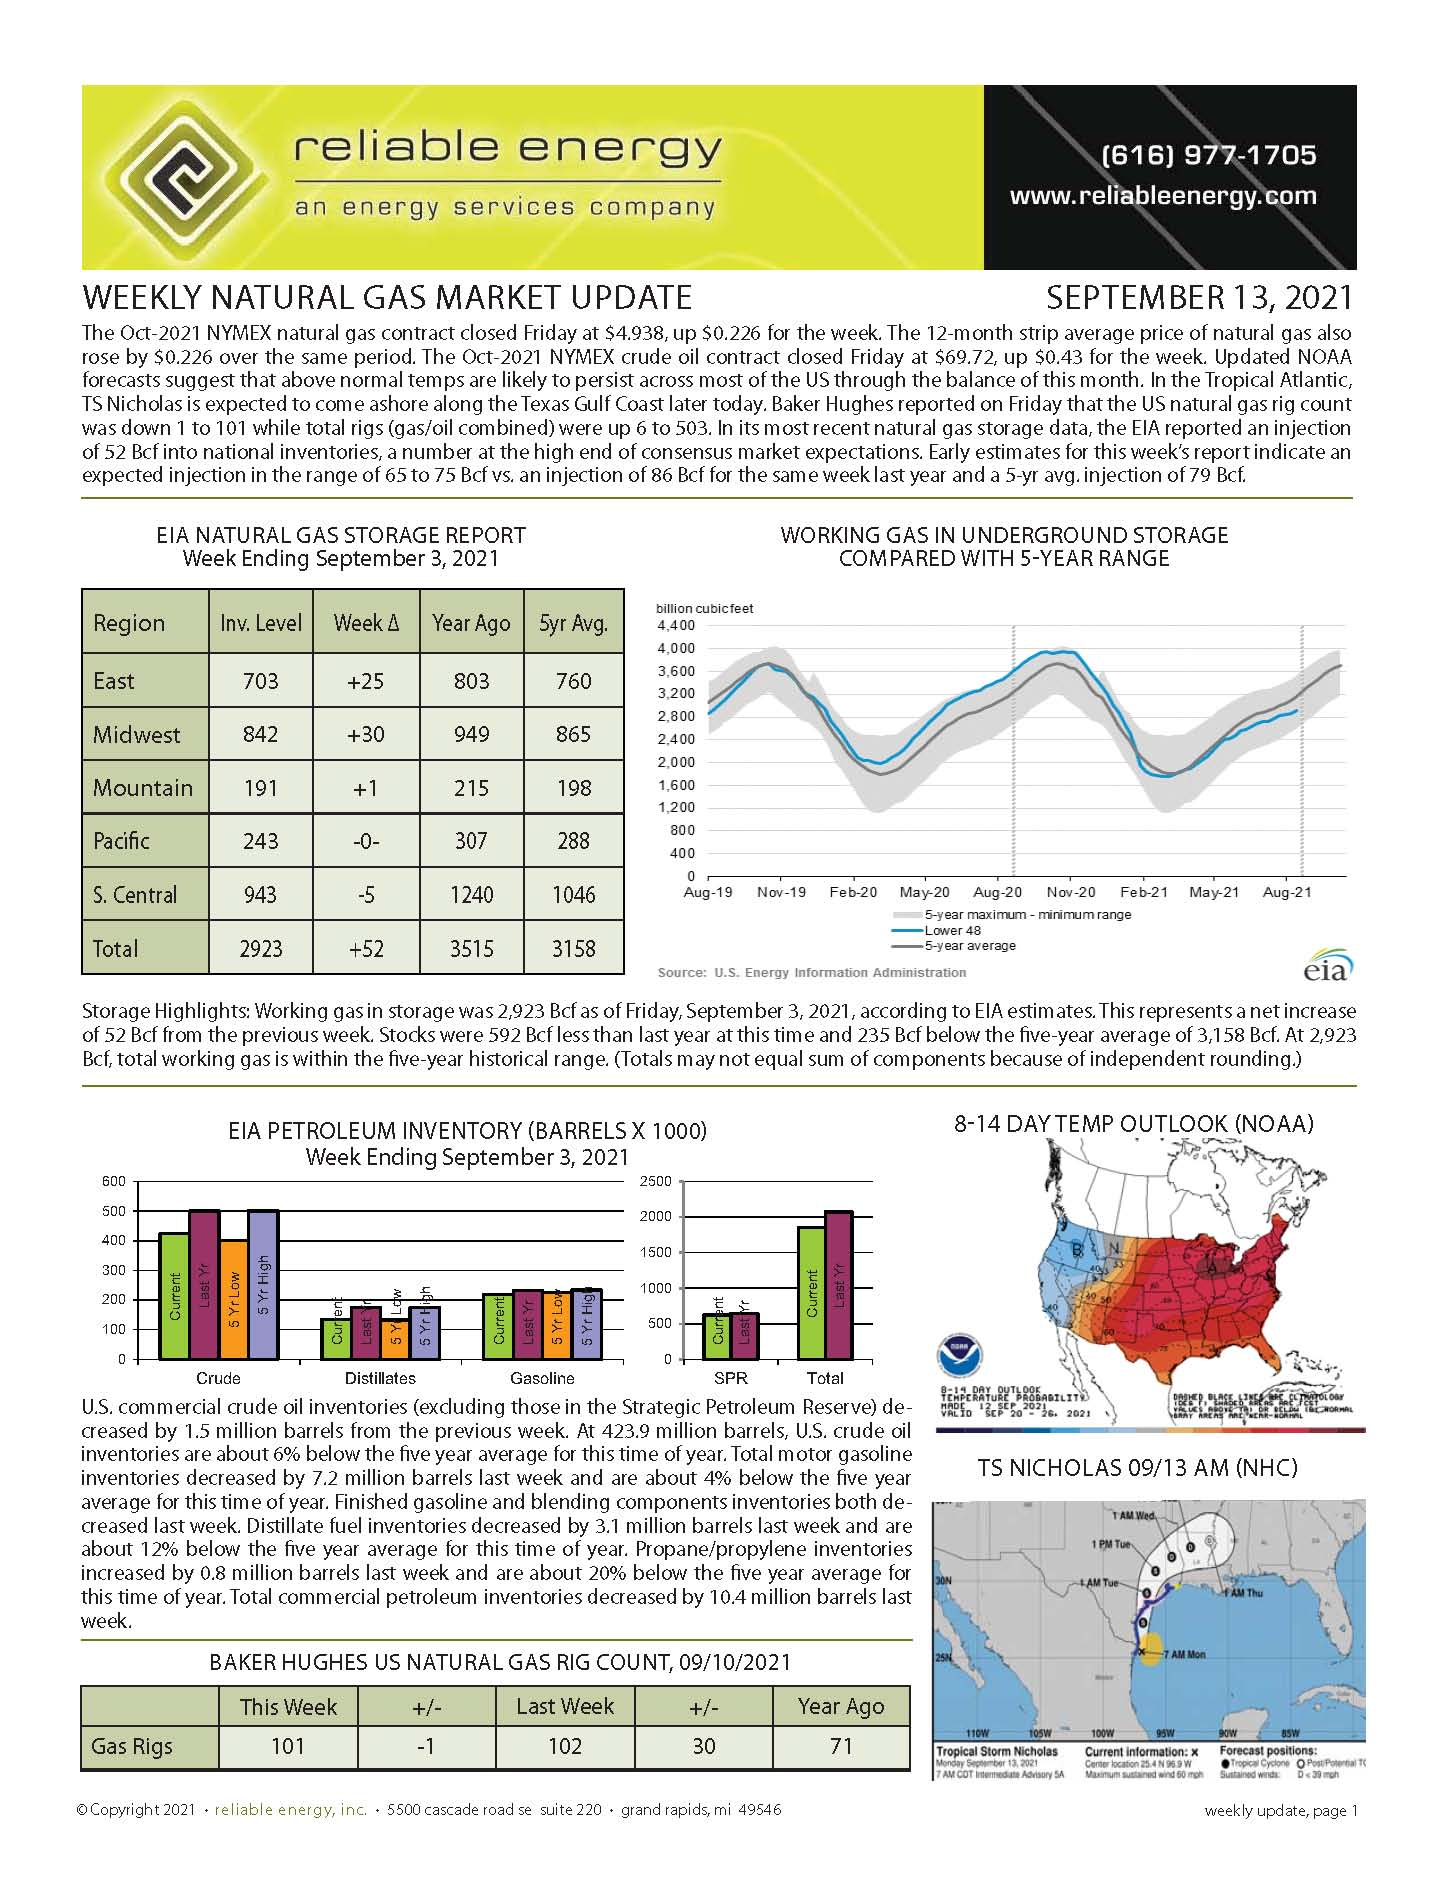 Natural Gas Market Update – September 13, 2021